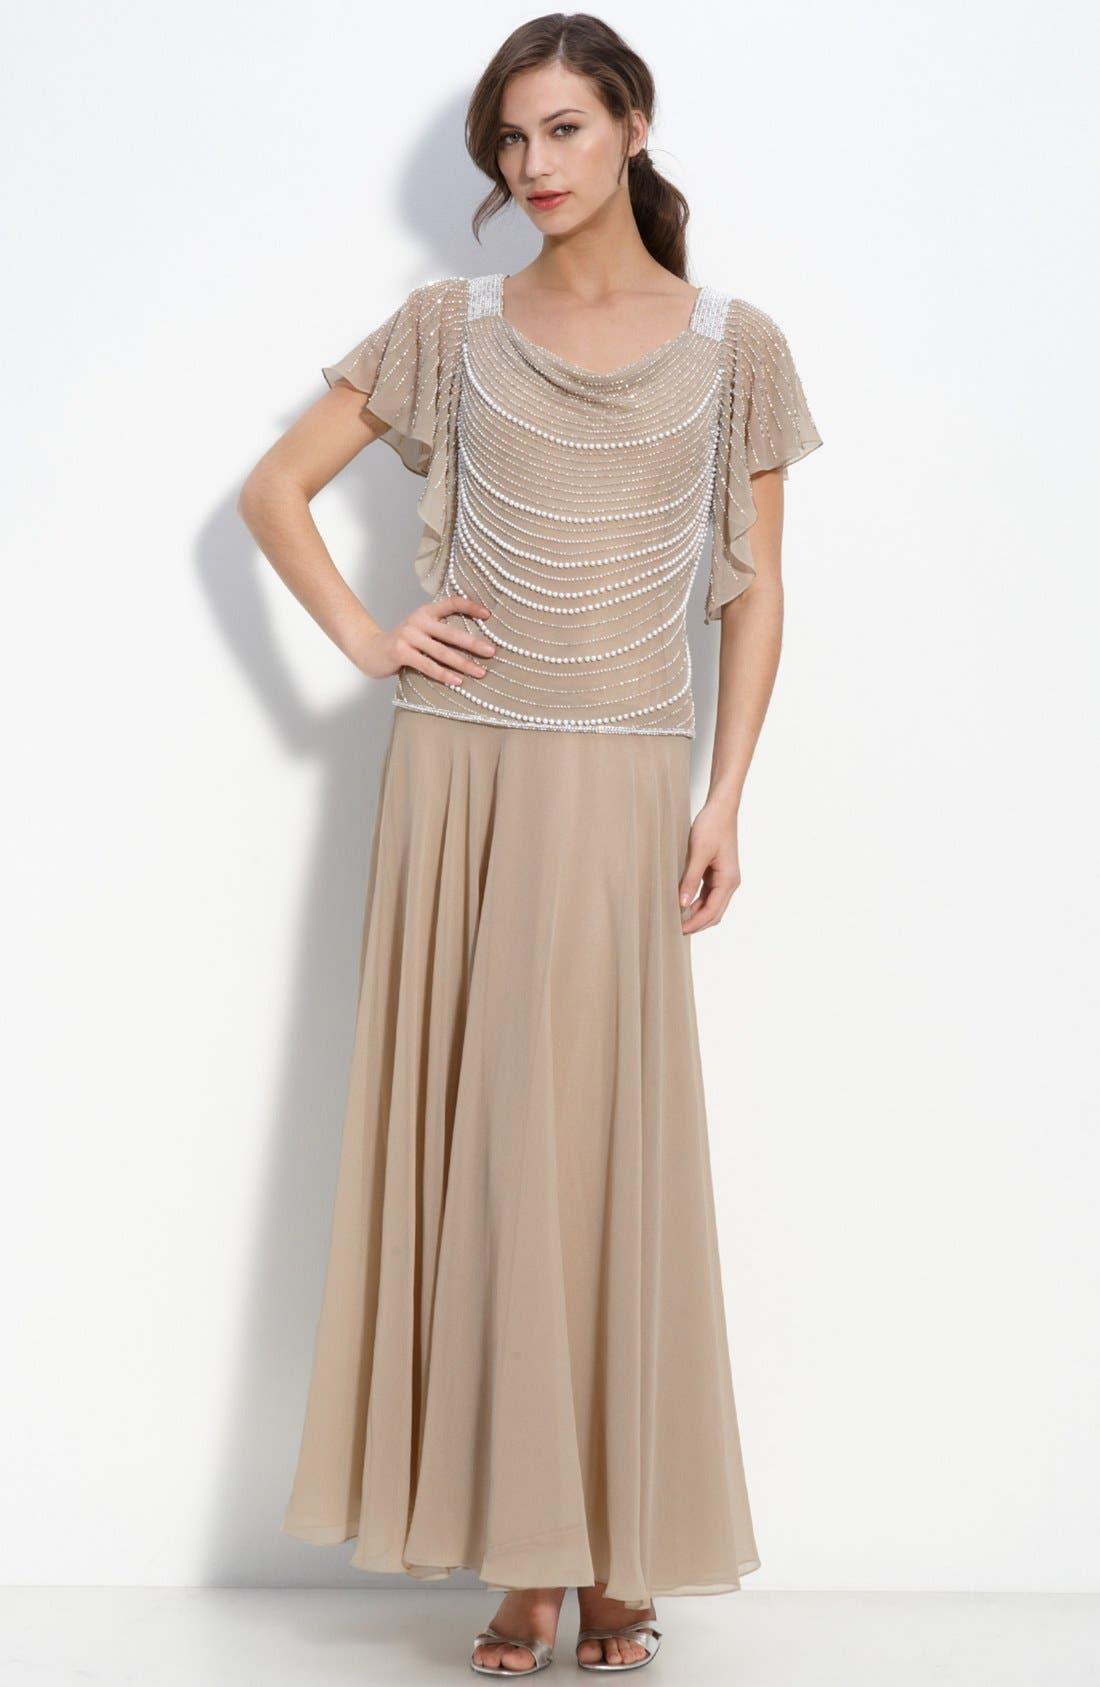 Alternate Image 1 Selected - J Kara Beaded Mock Two-Piece Crepe Dress